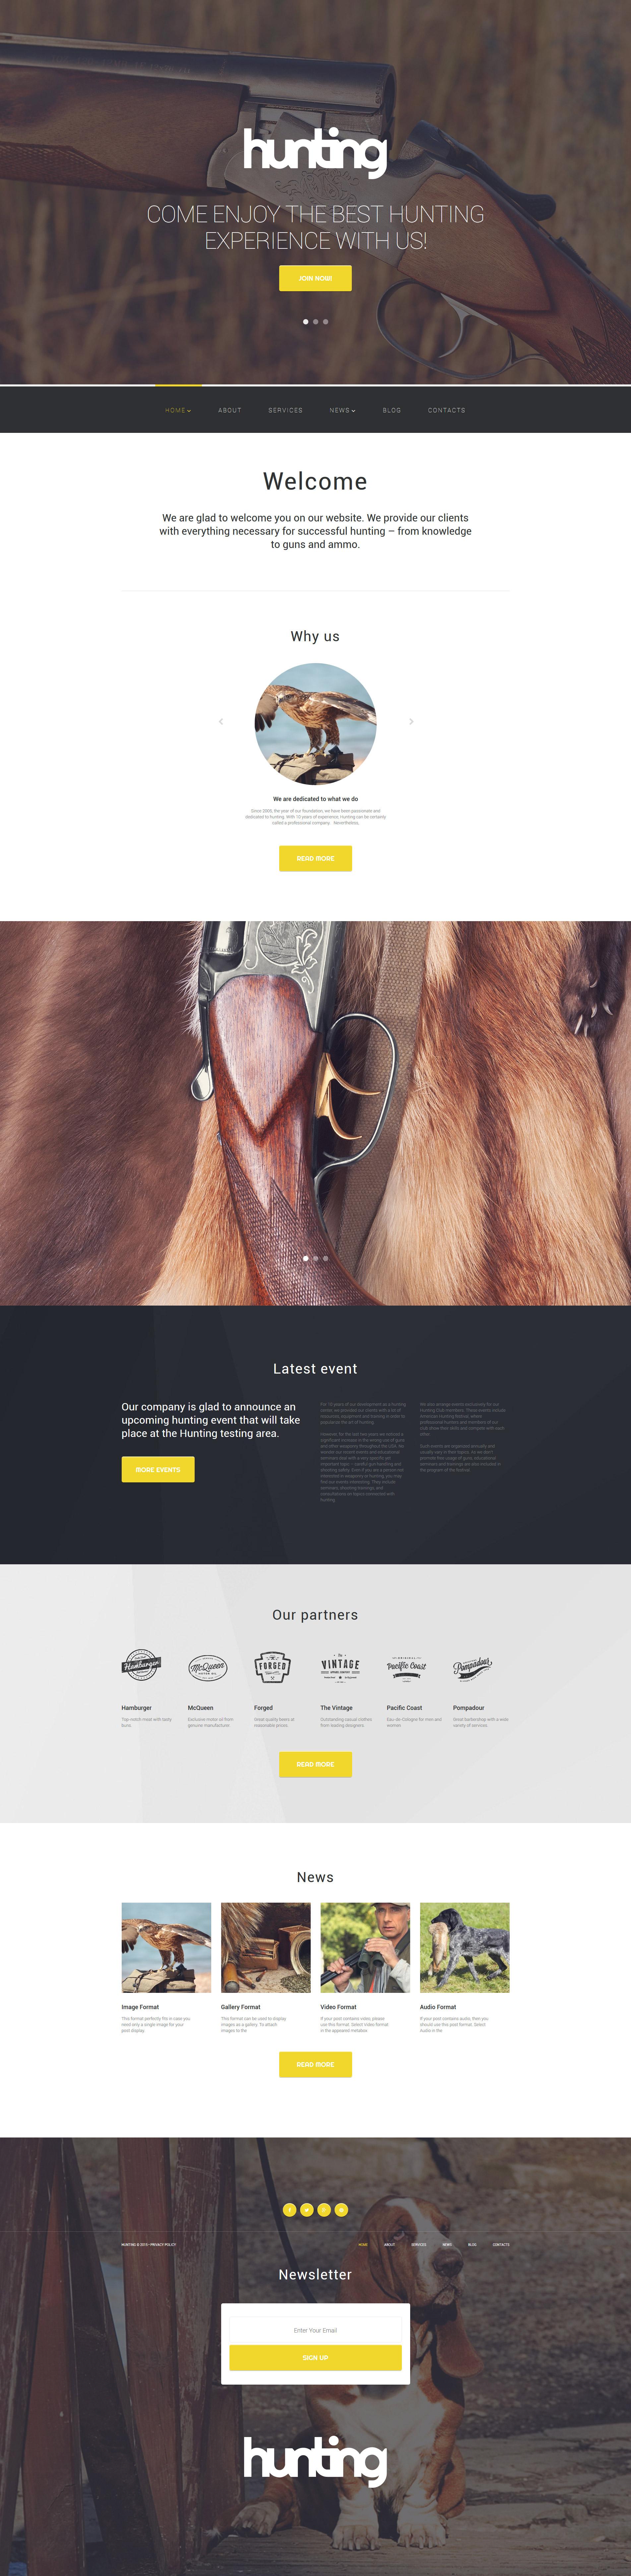 Responsive Hunting Club Wordpress #56020